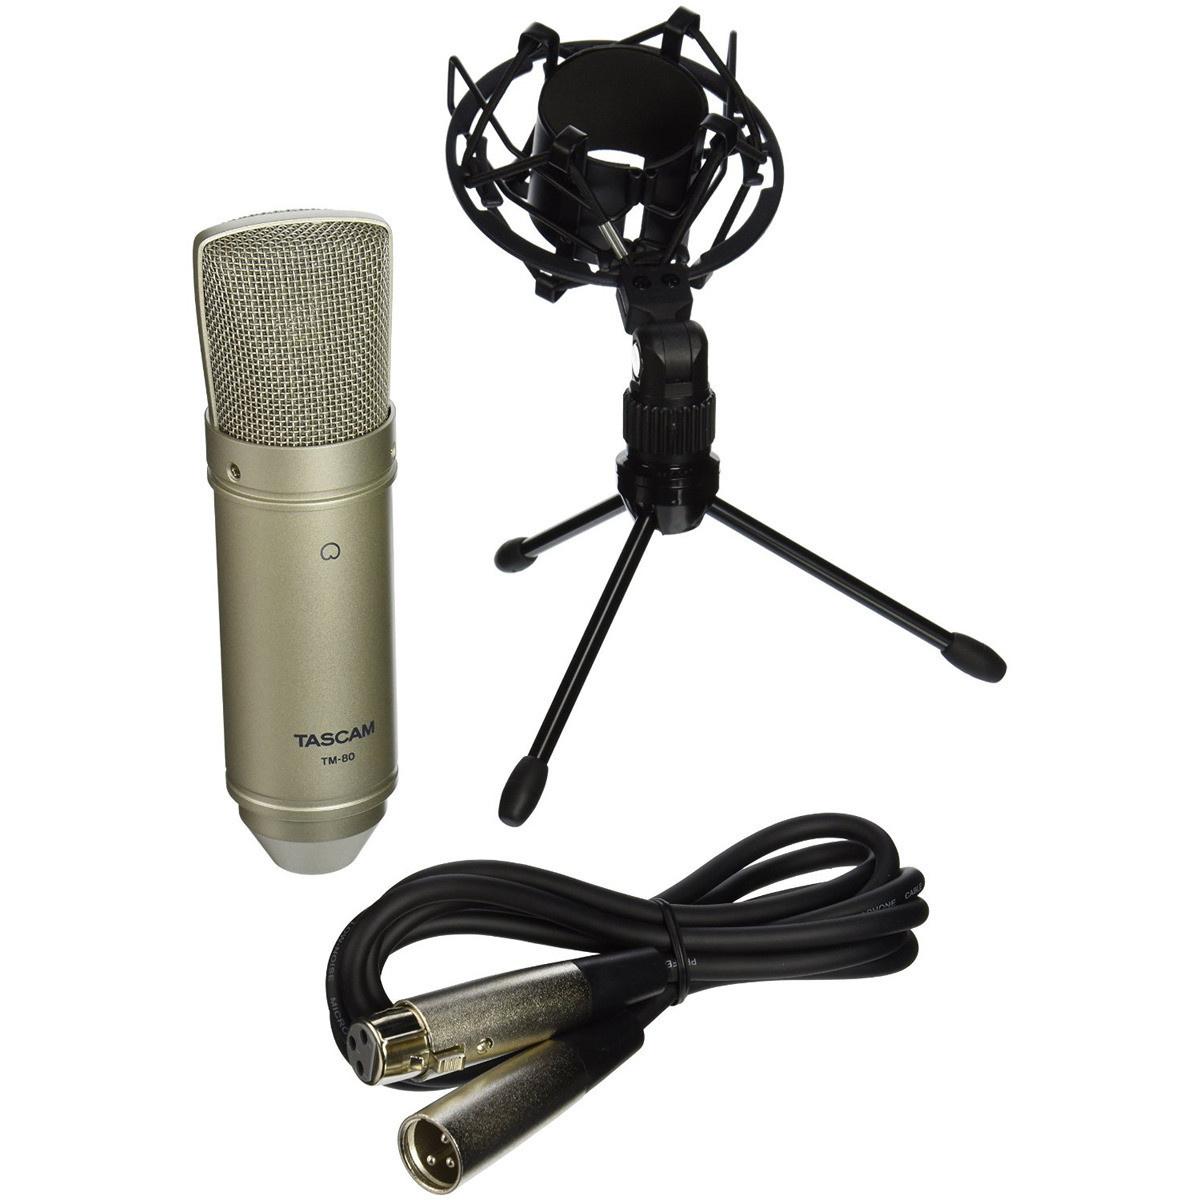 Tascam Tascam TM-180 Condenser Microphone